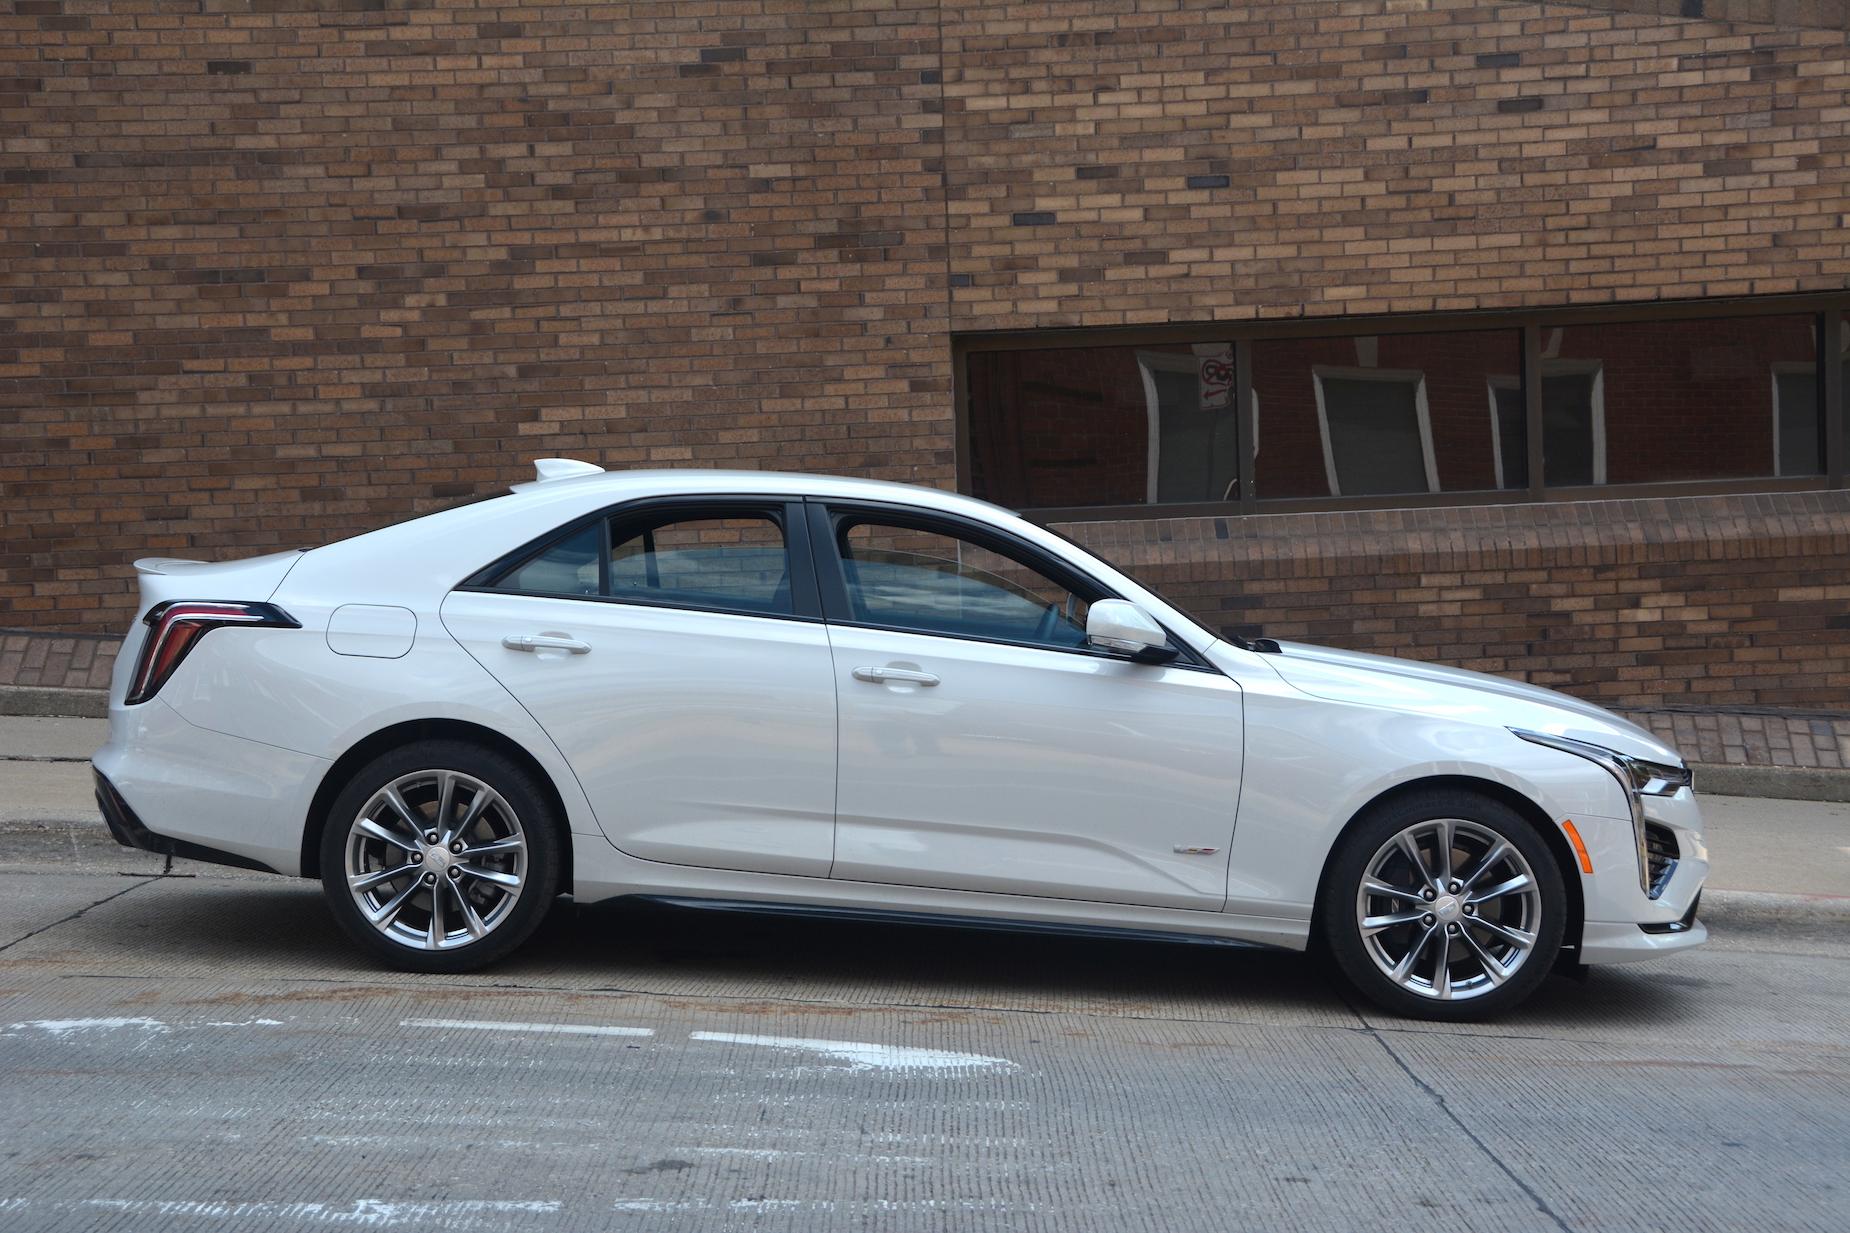 2021 Cadillac CT4-V white